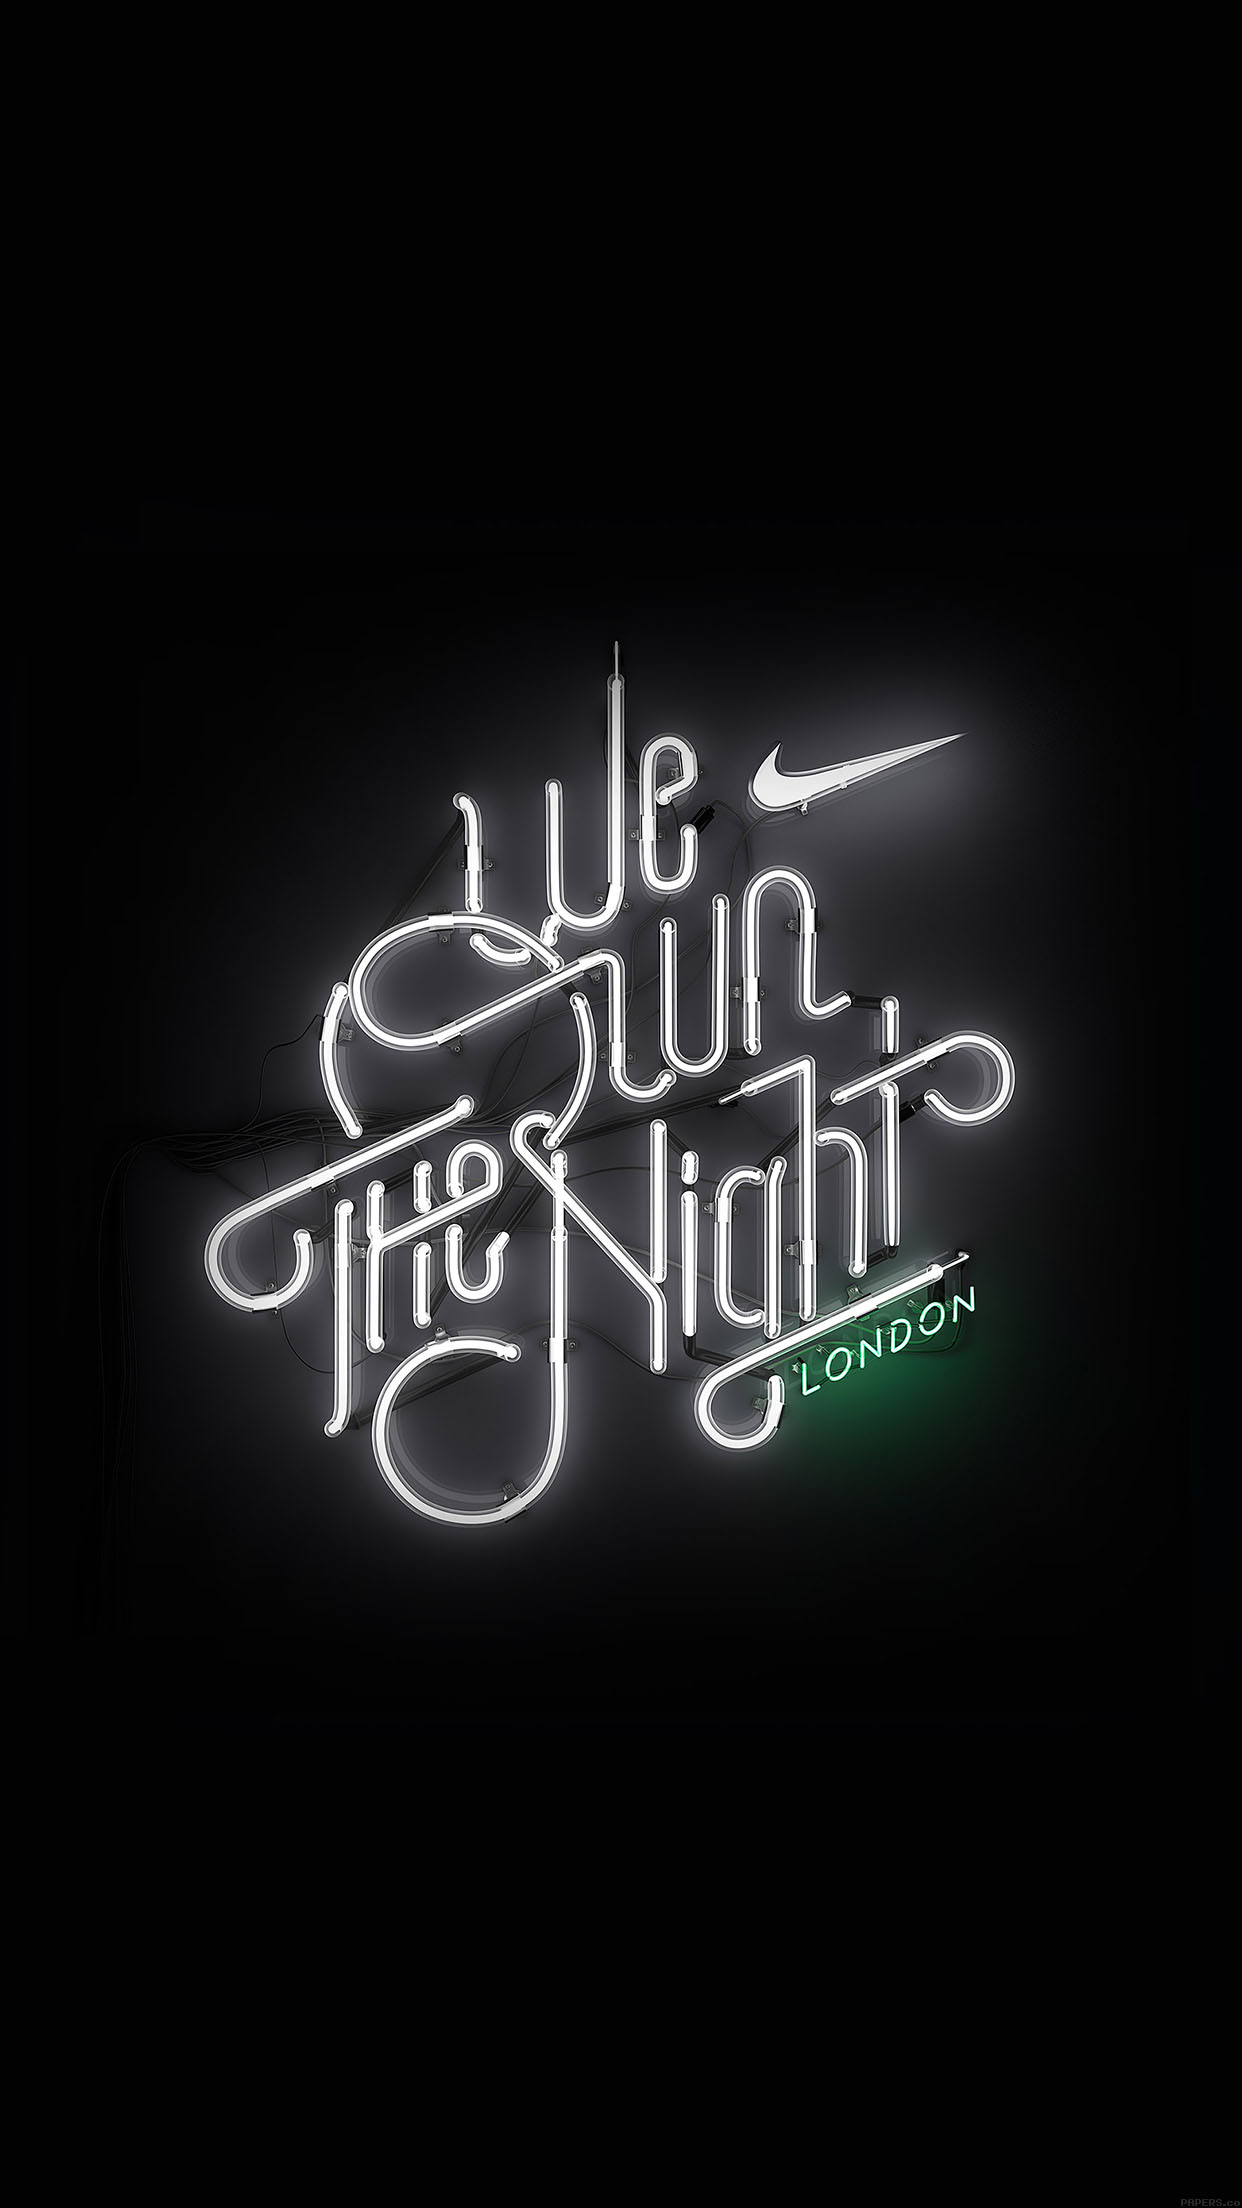 ab35-wallpaper-we-run-the-night-london-logo-nike - Papers.co